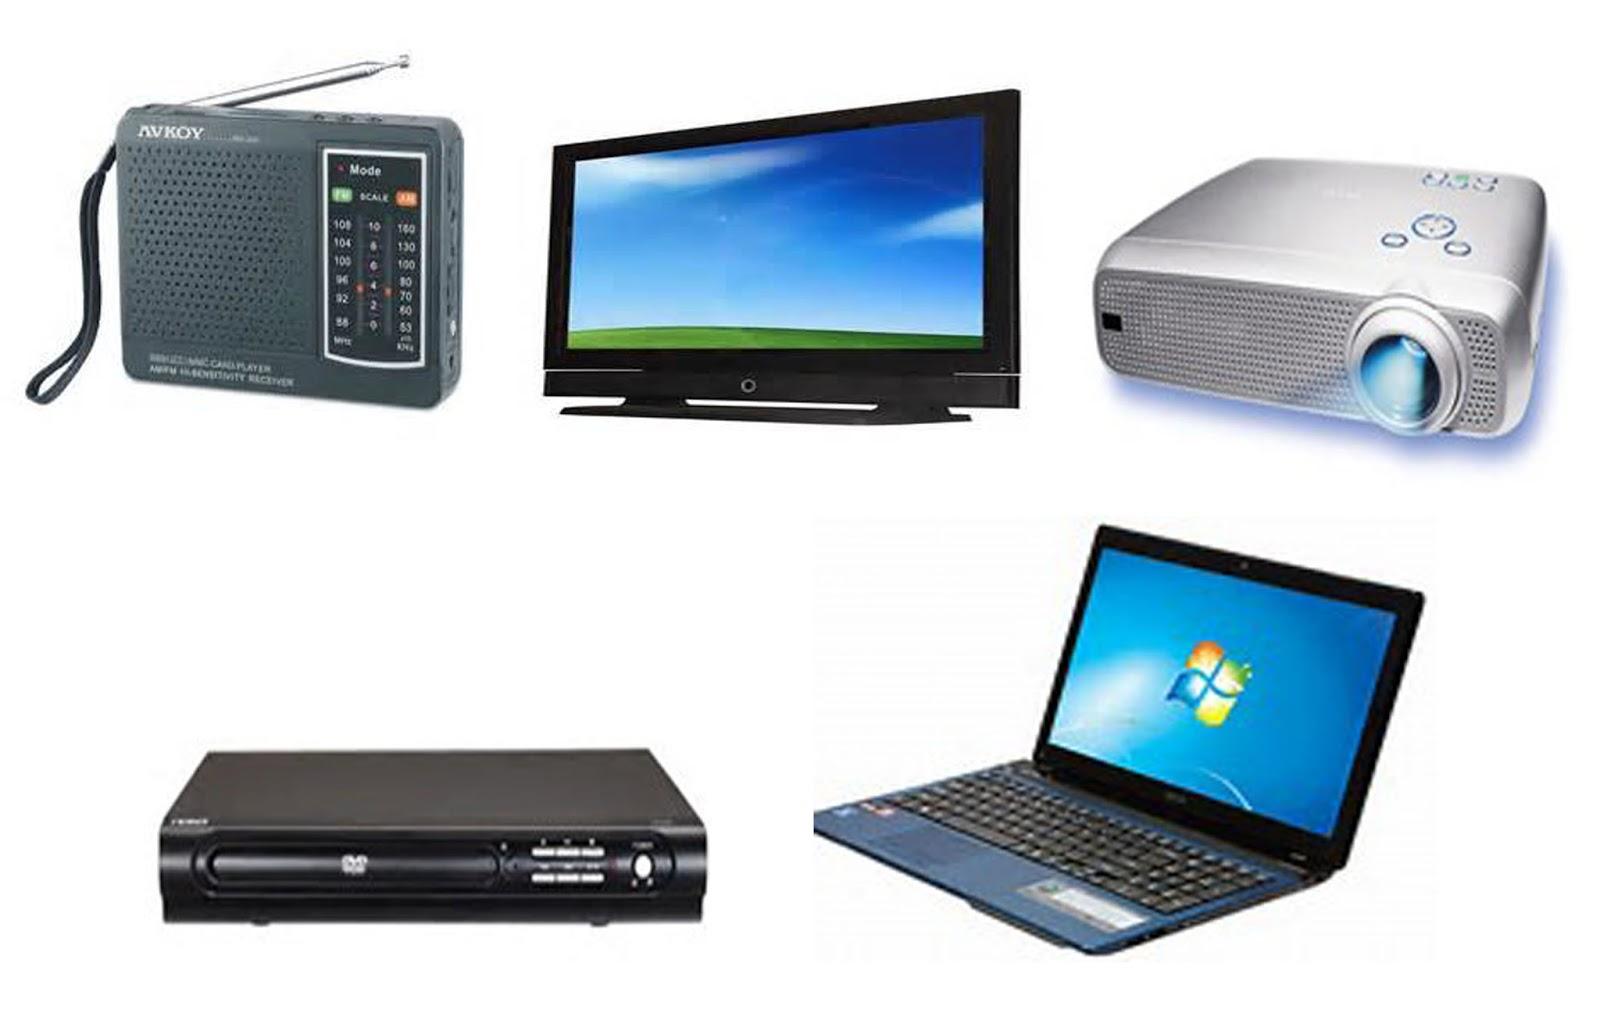 technology educational meaning education hardware history software future scope am nature educator its